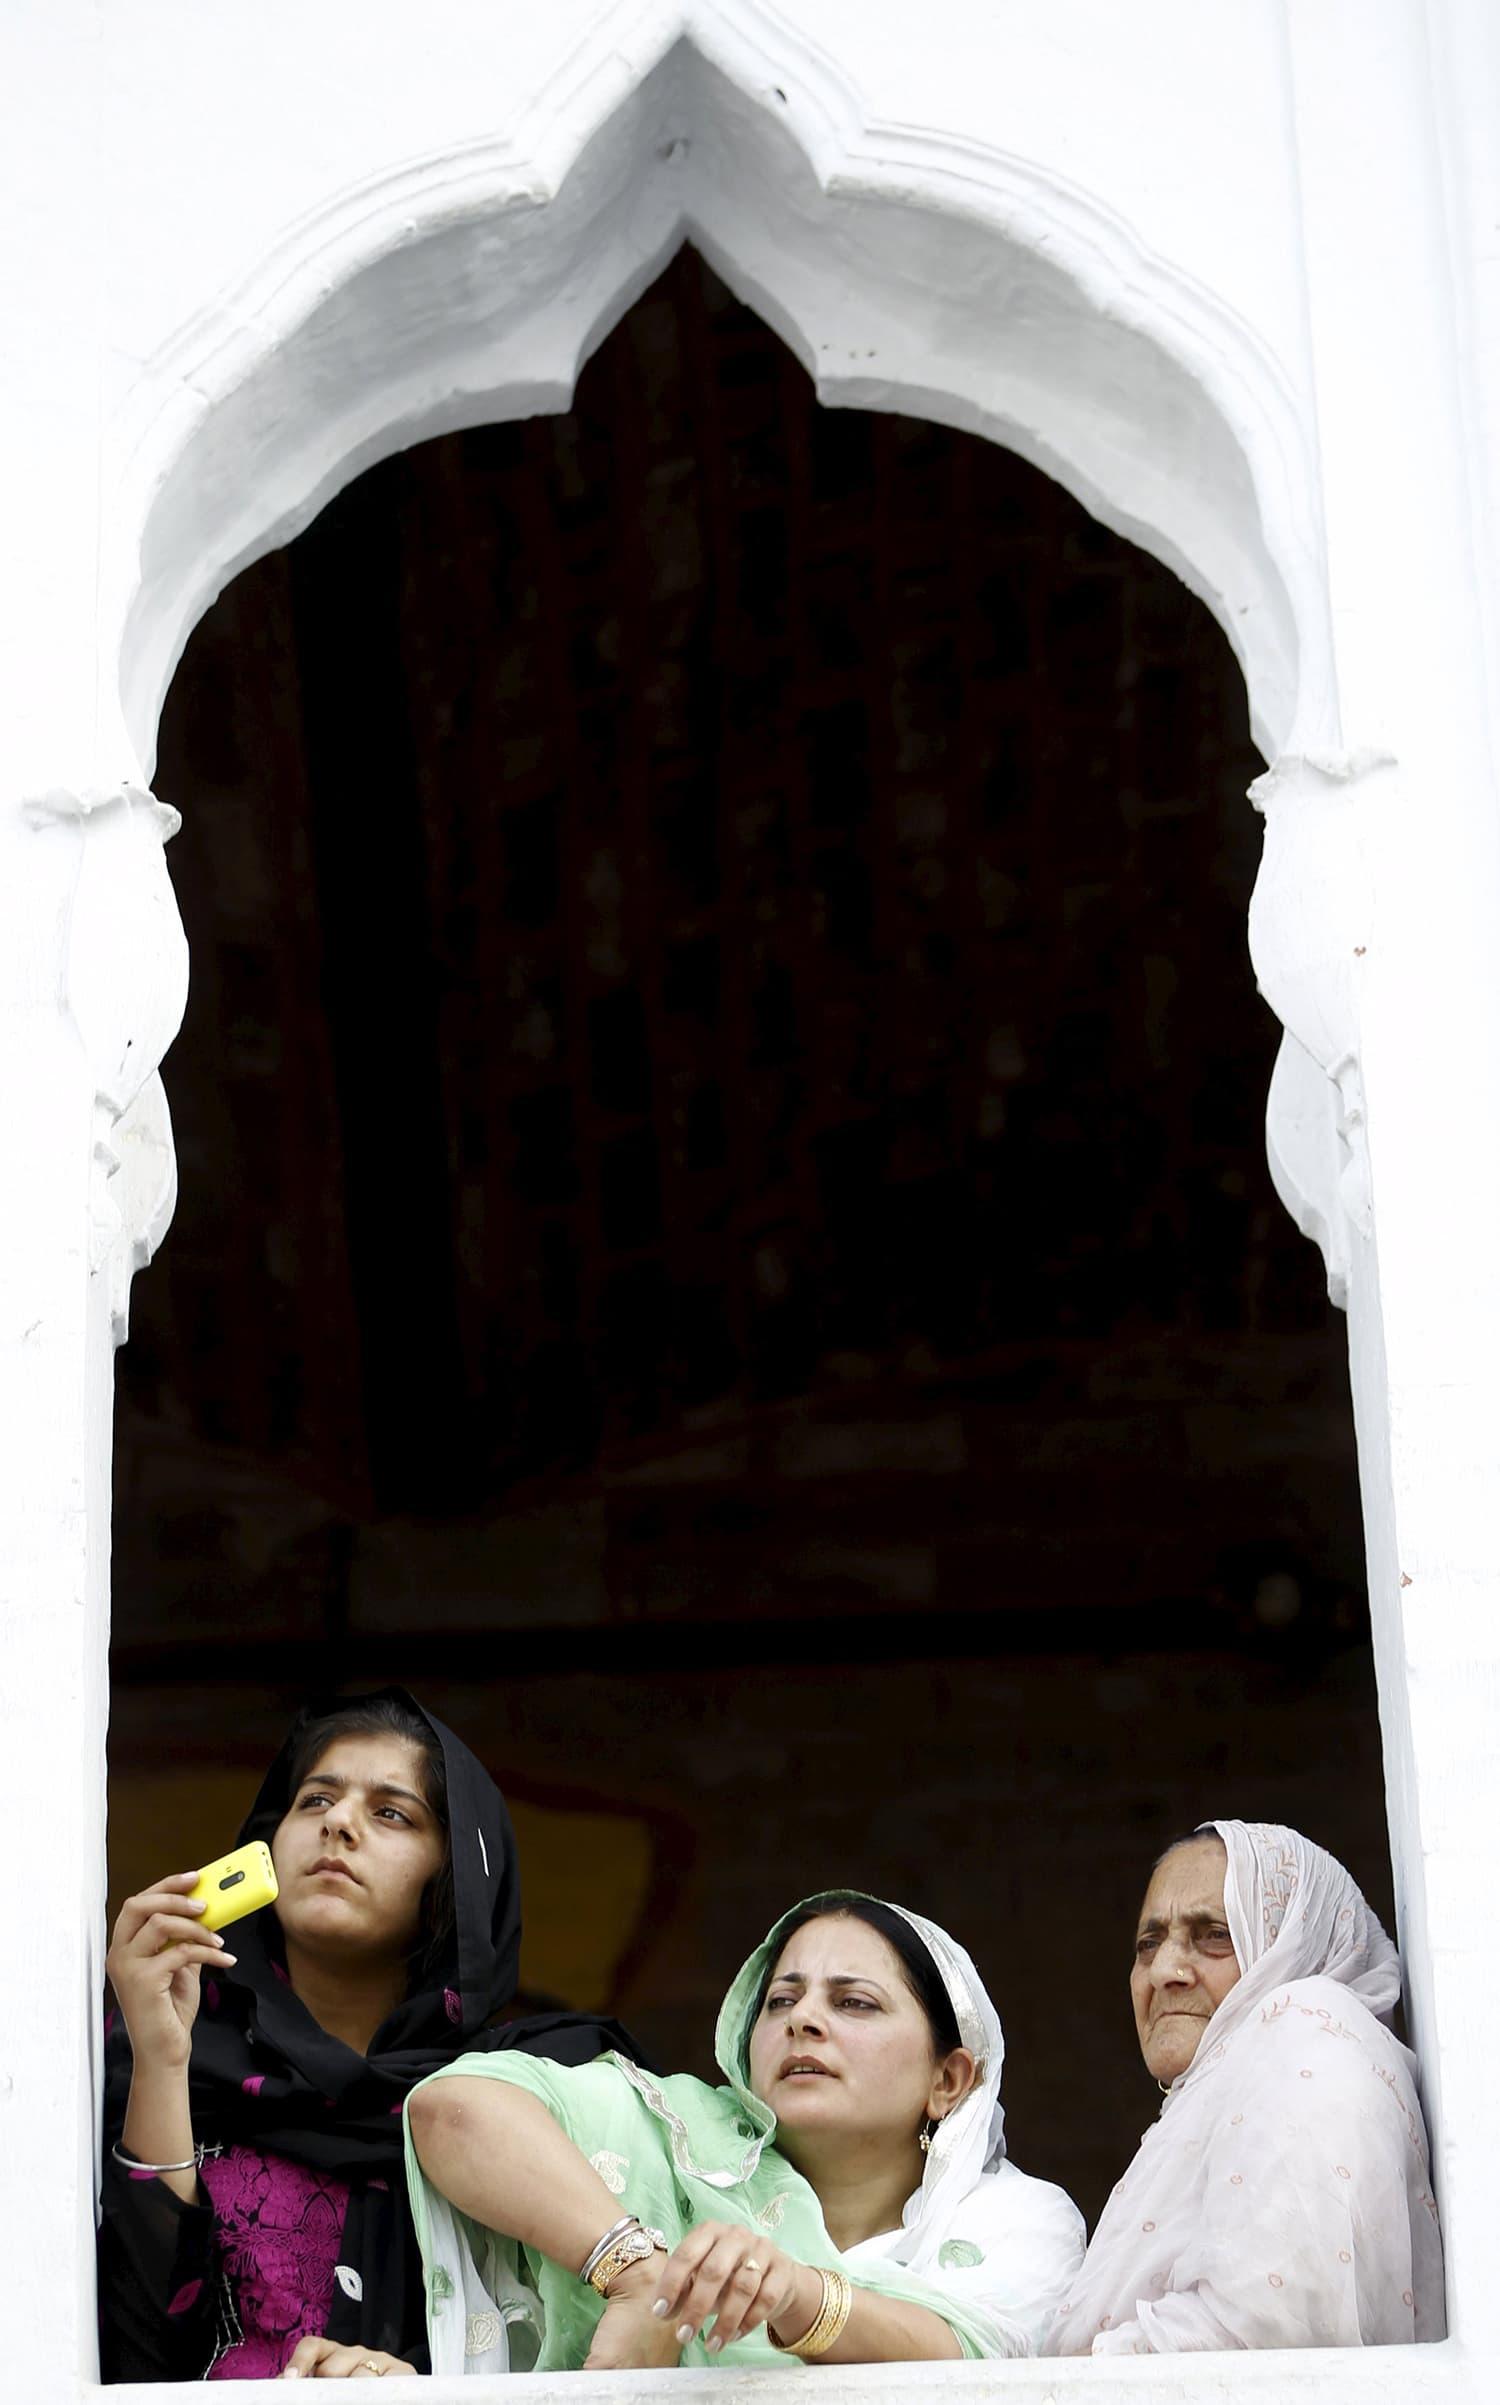 Sikh devotees watch the Baisakhi festival at Panja Sahib shrine in Hassan Abdal.—Reuters